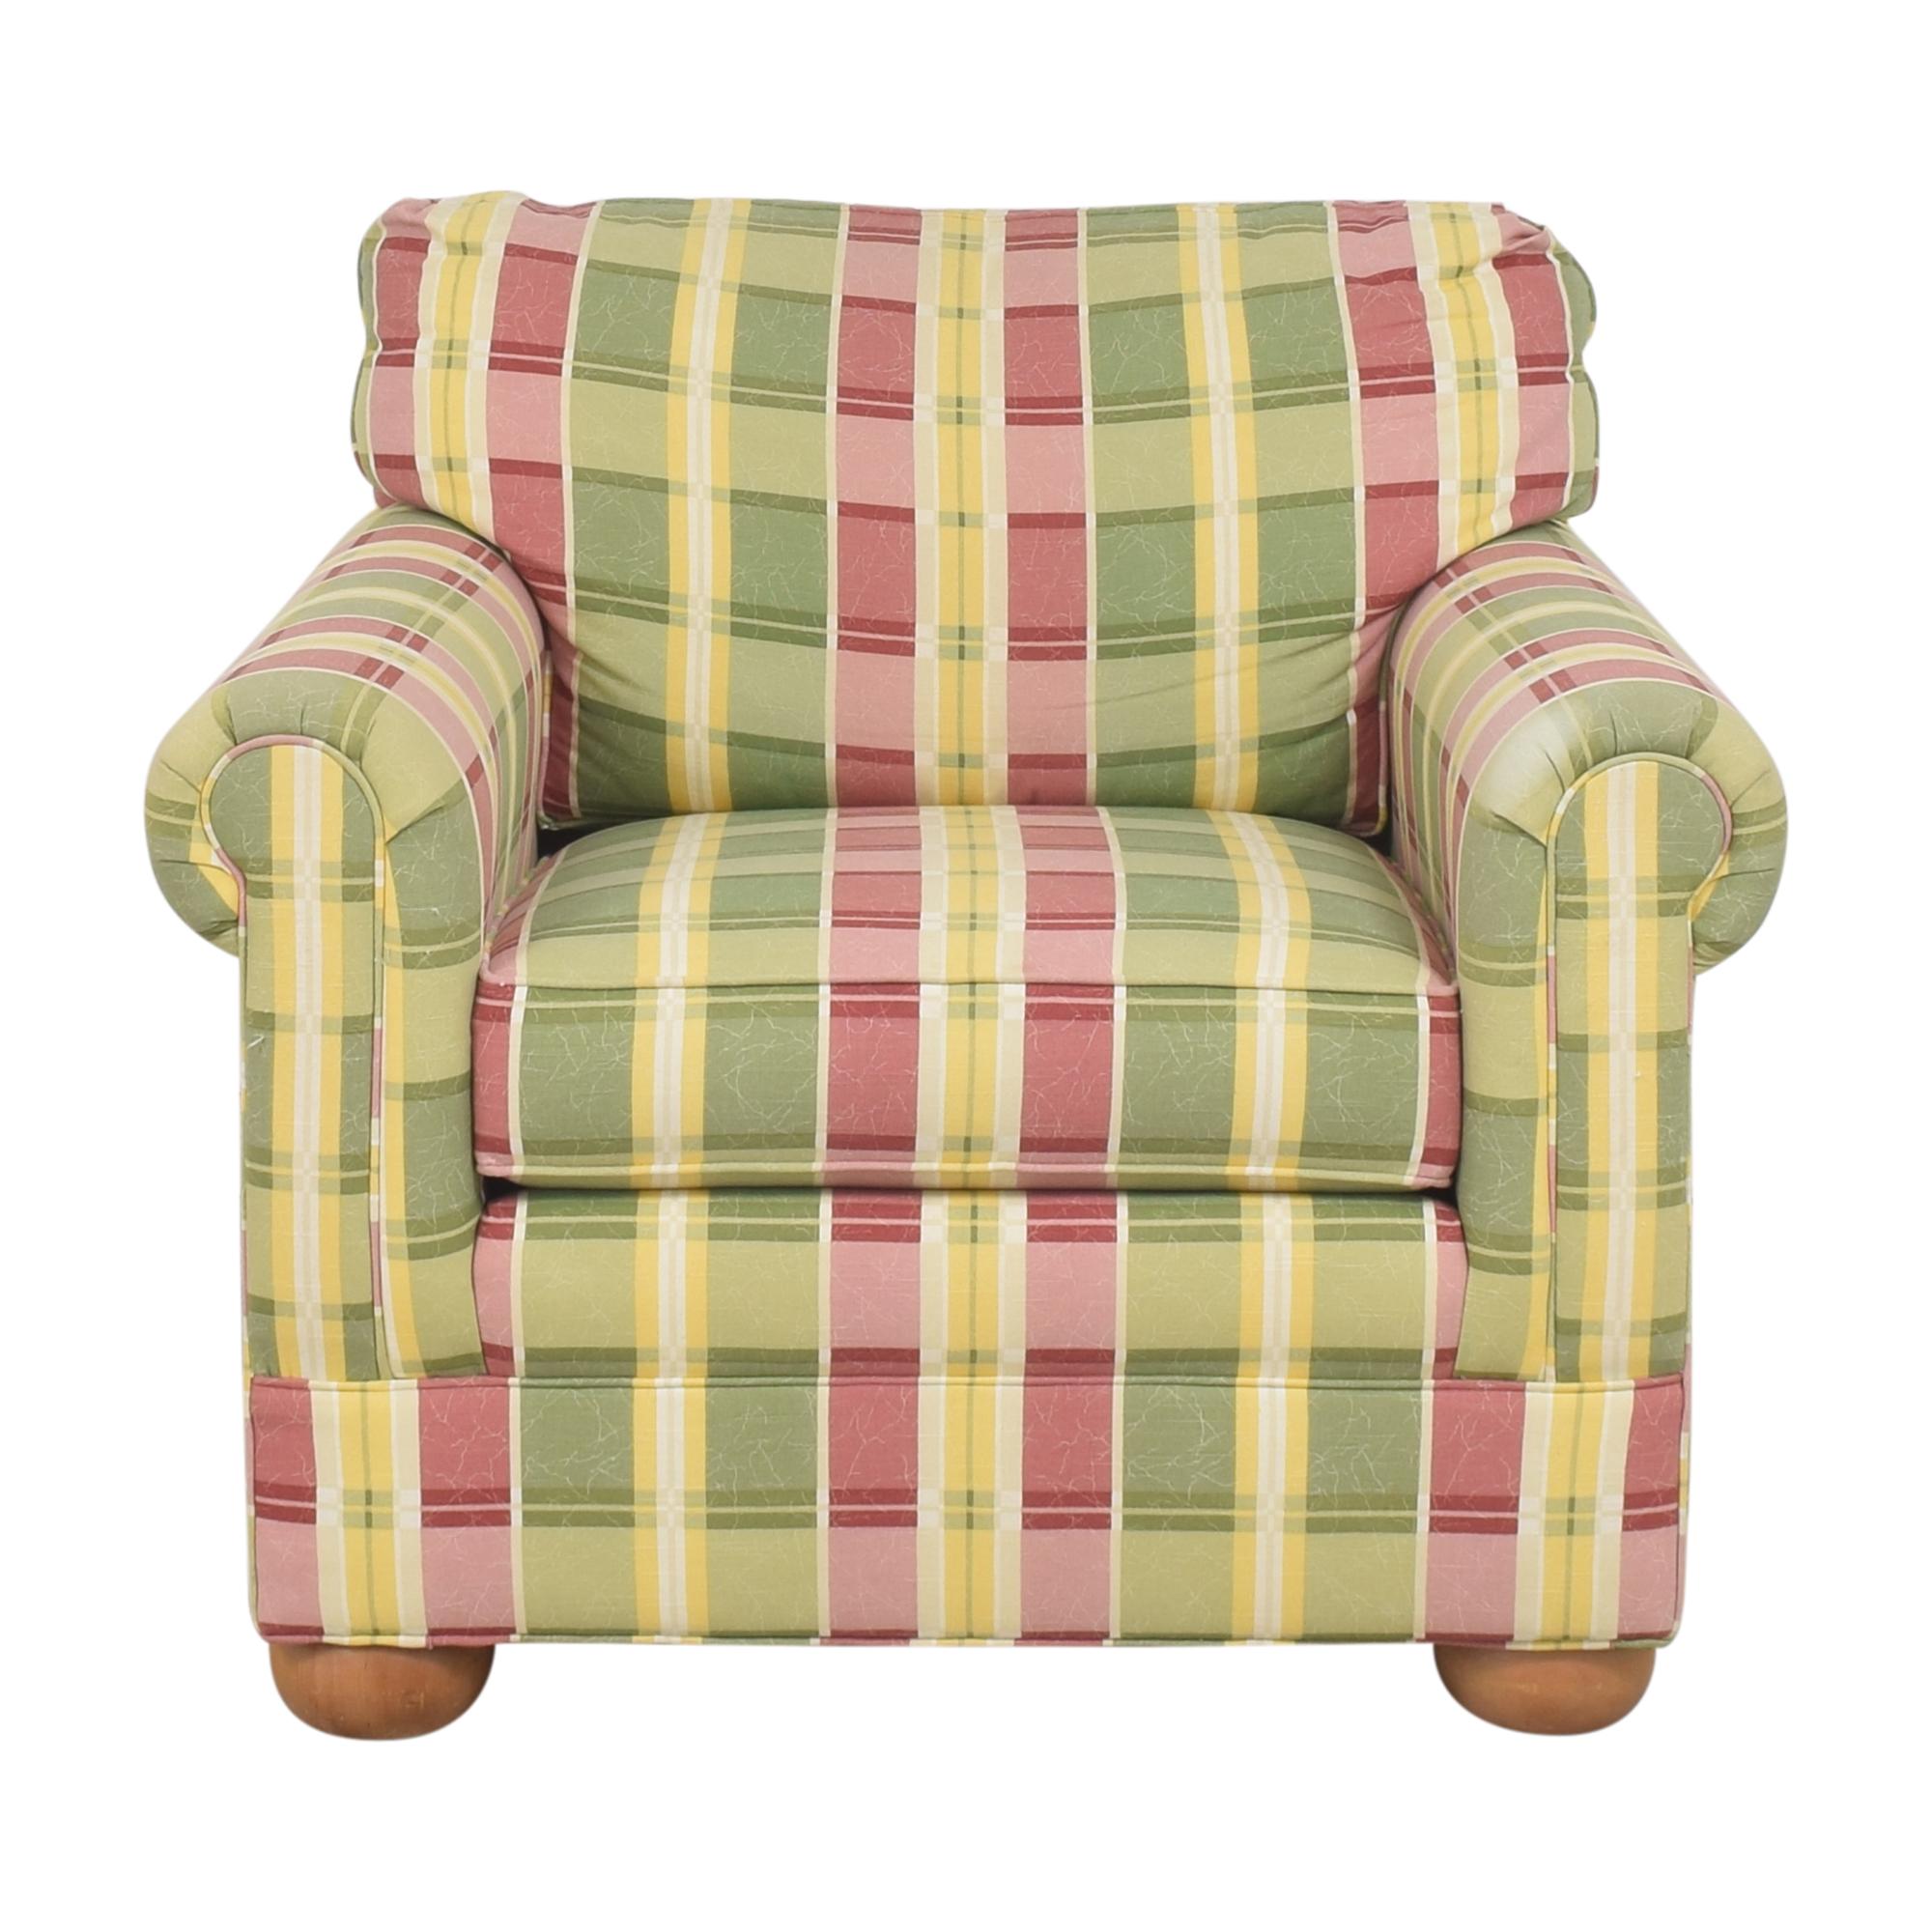 shop Ethan Allen Ethan Allen Plaid Club Chair online